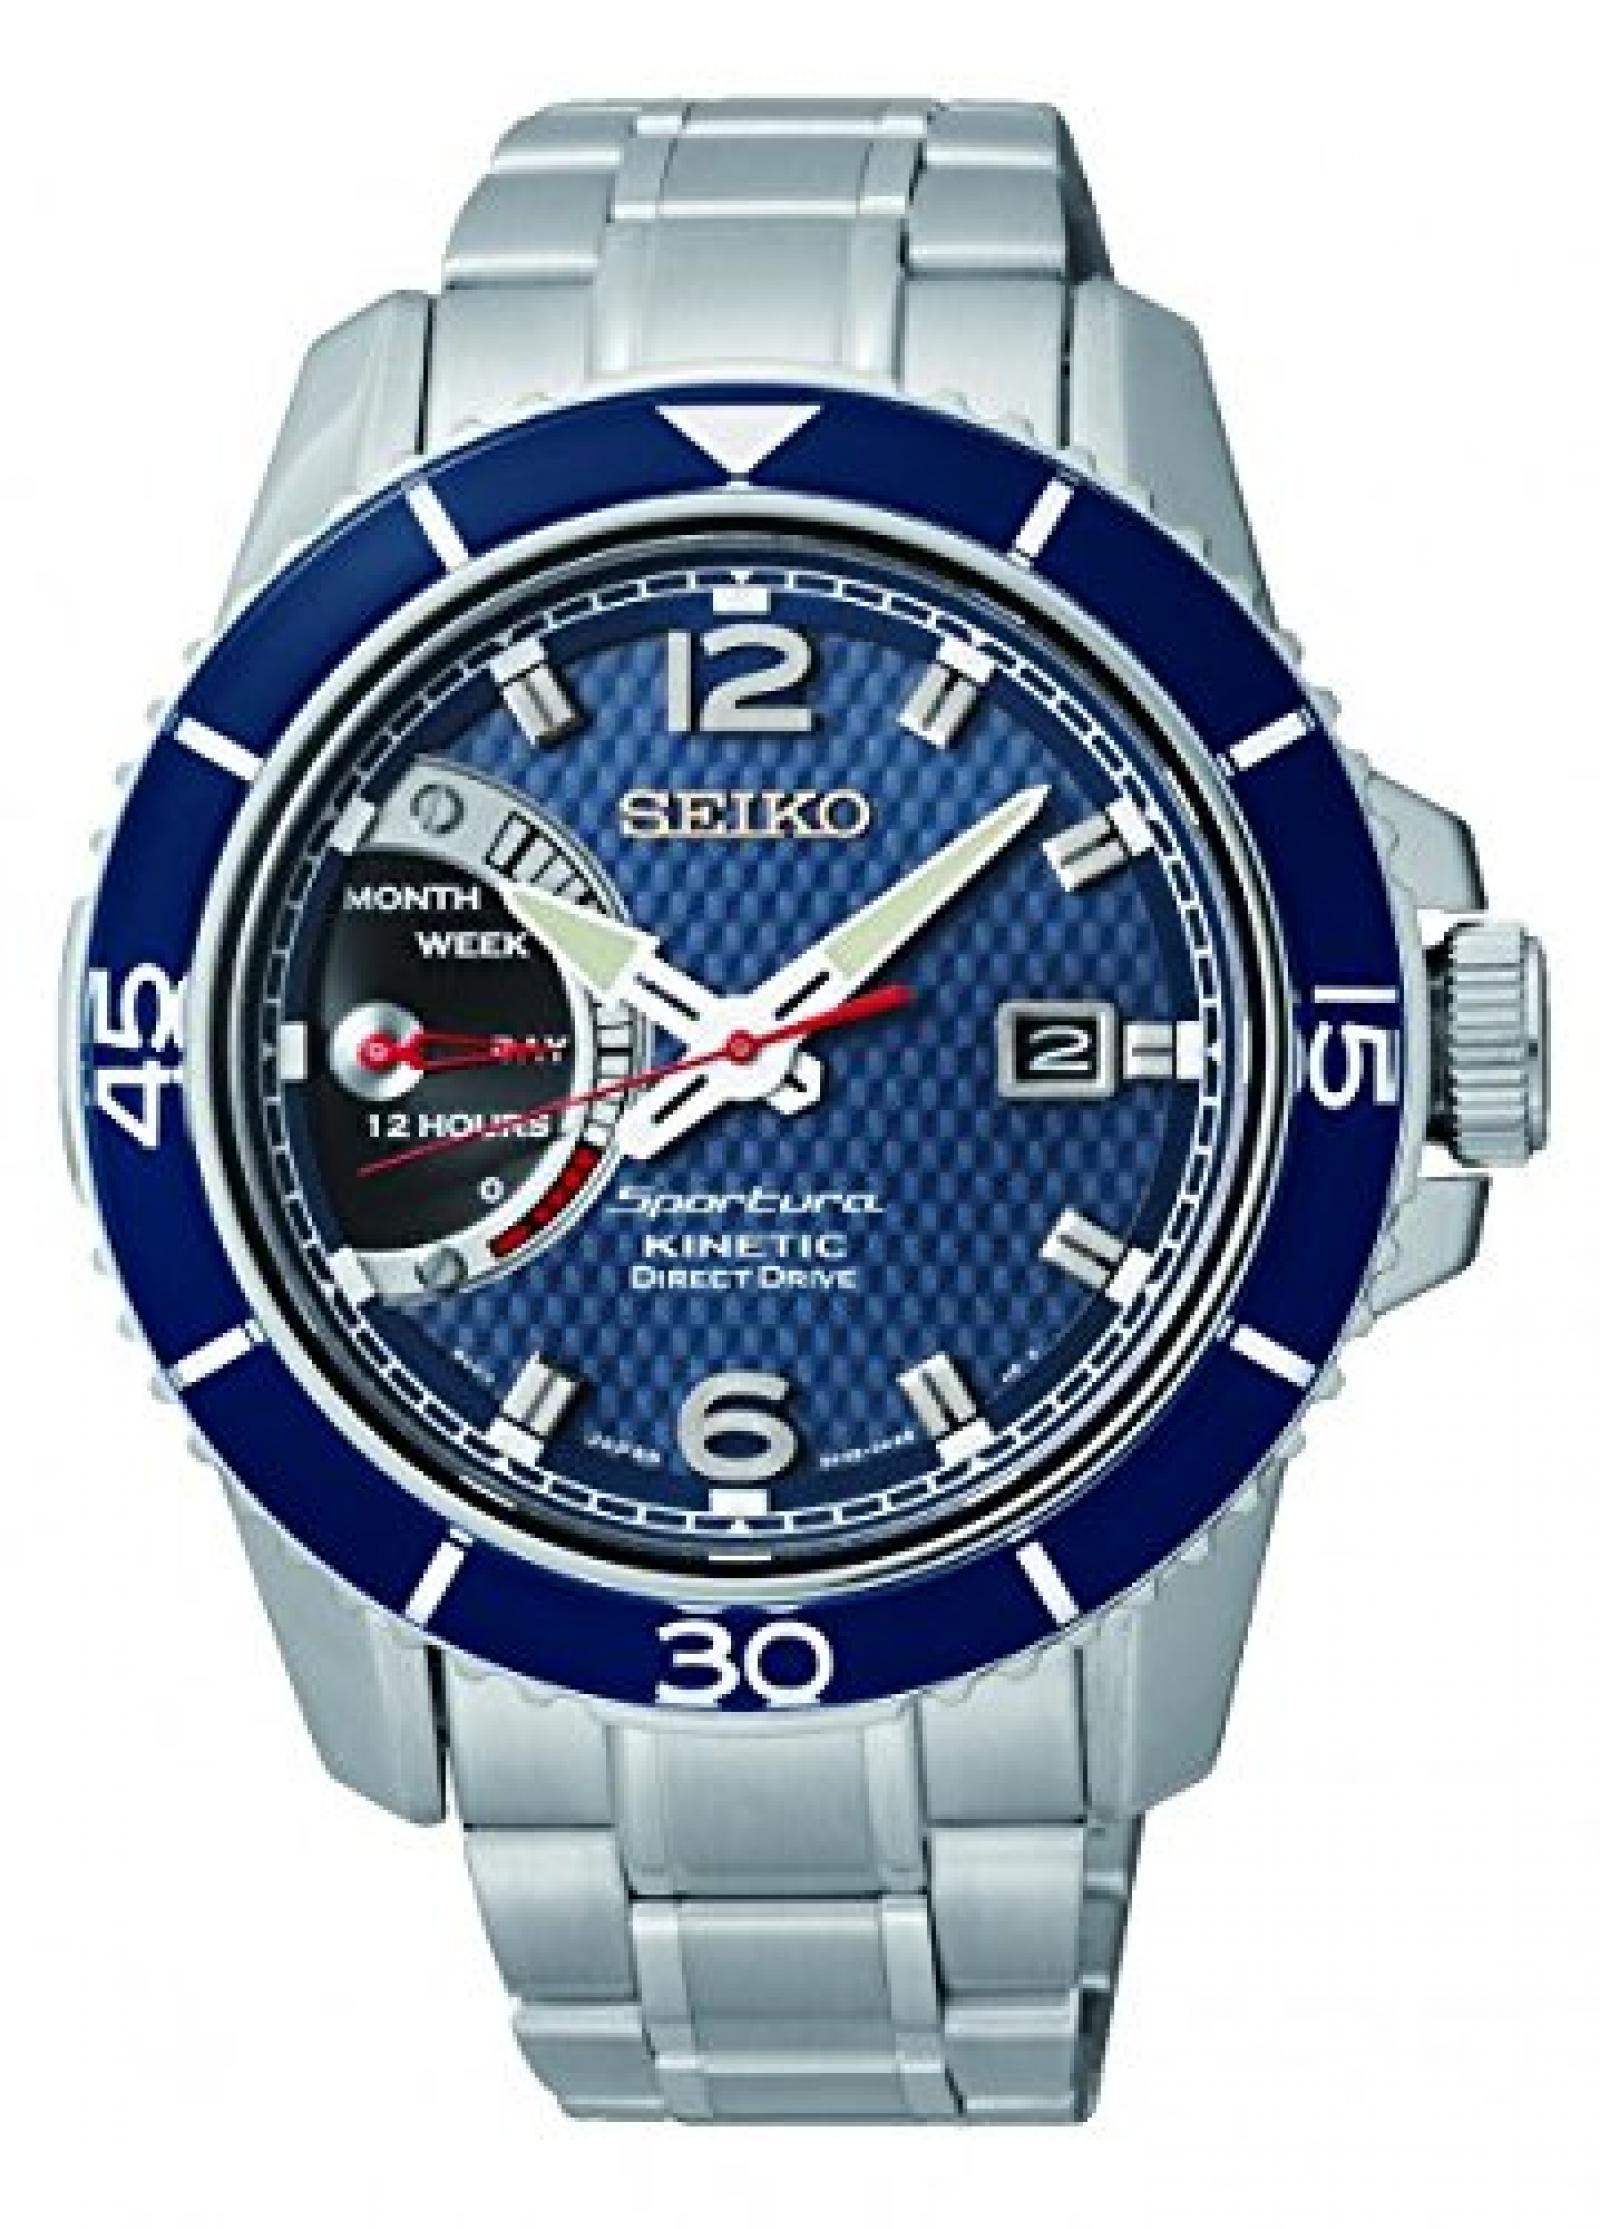 Seiko Herren-Armbanduhr XL Sportura Kinetic Analog Quarz Edelstahl SRG017P1